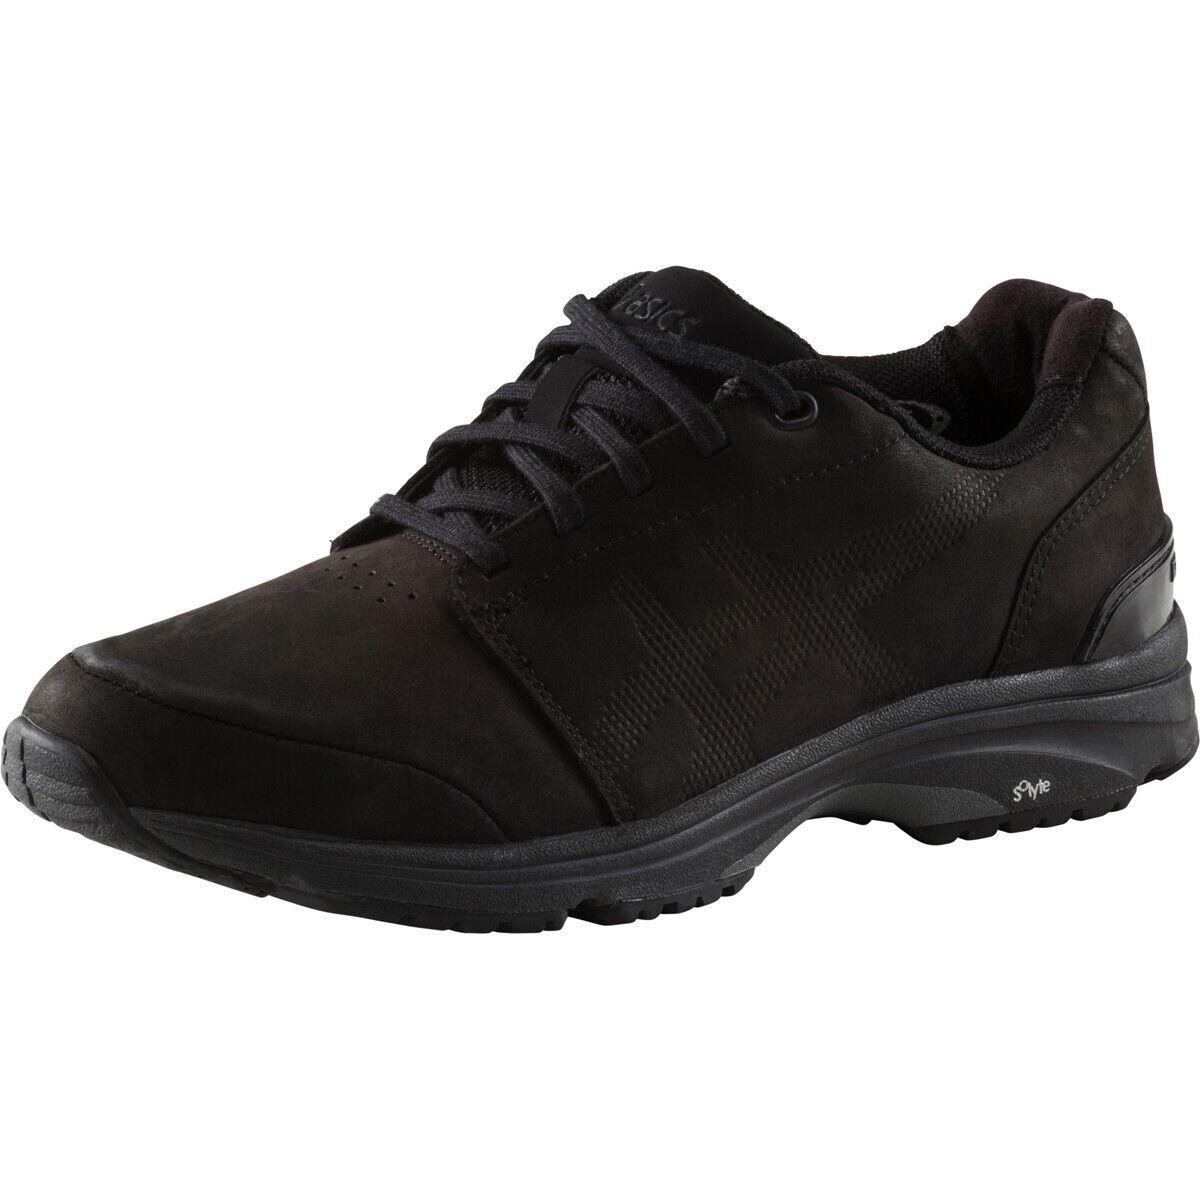 Asics Walkingschuhe Gel Odyssey WR Damen Schuhe Black